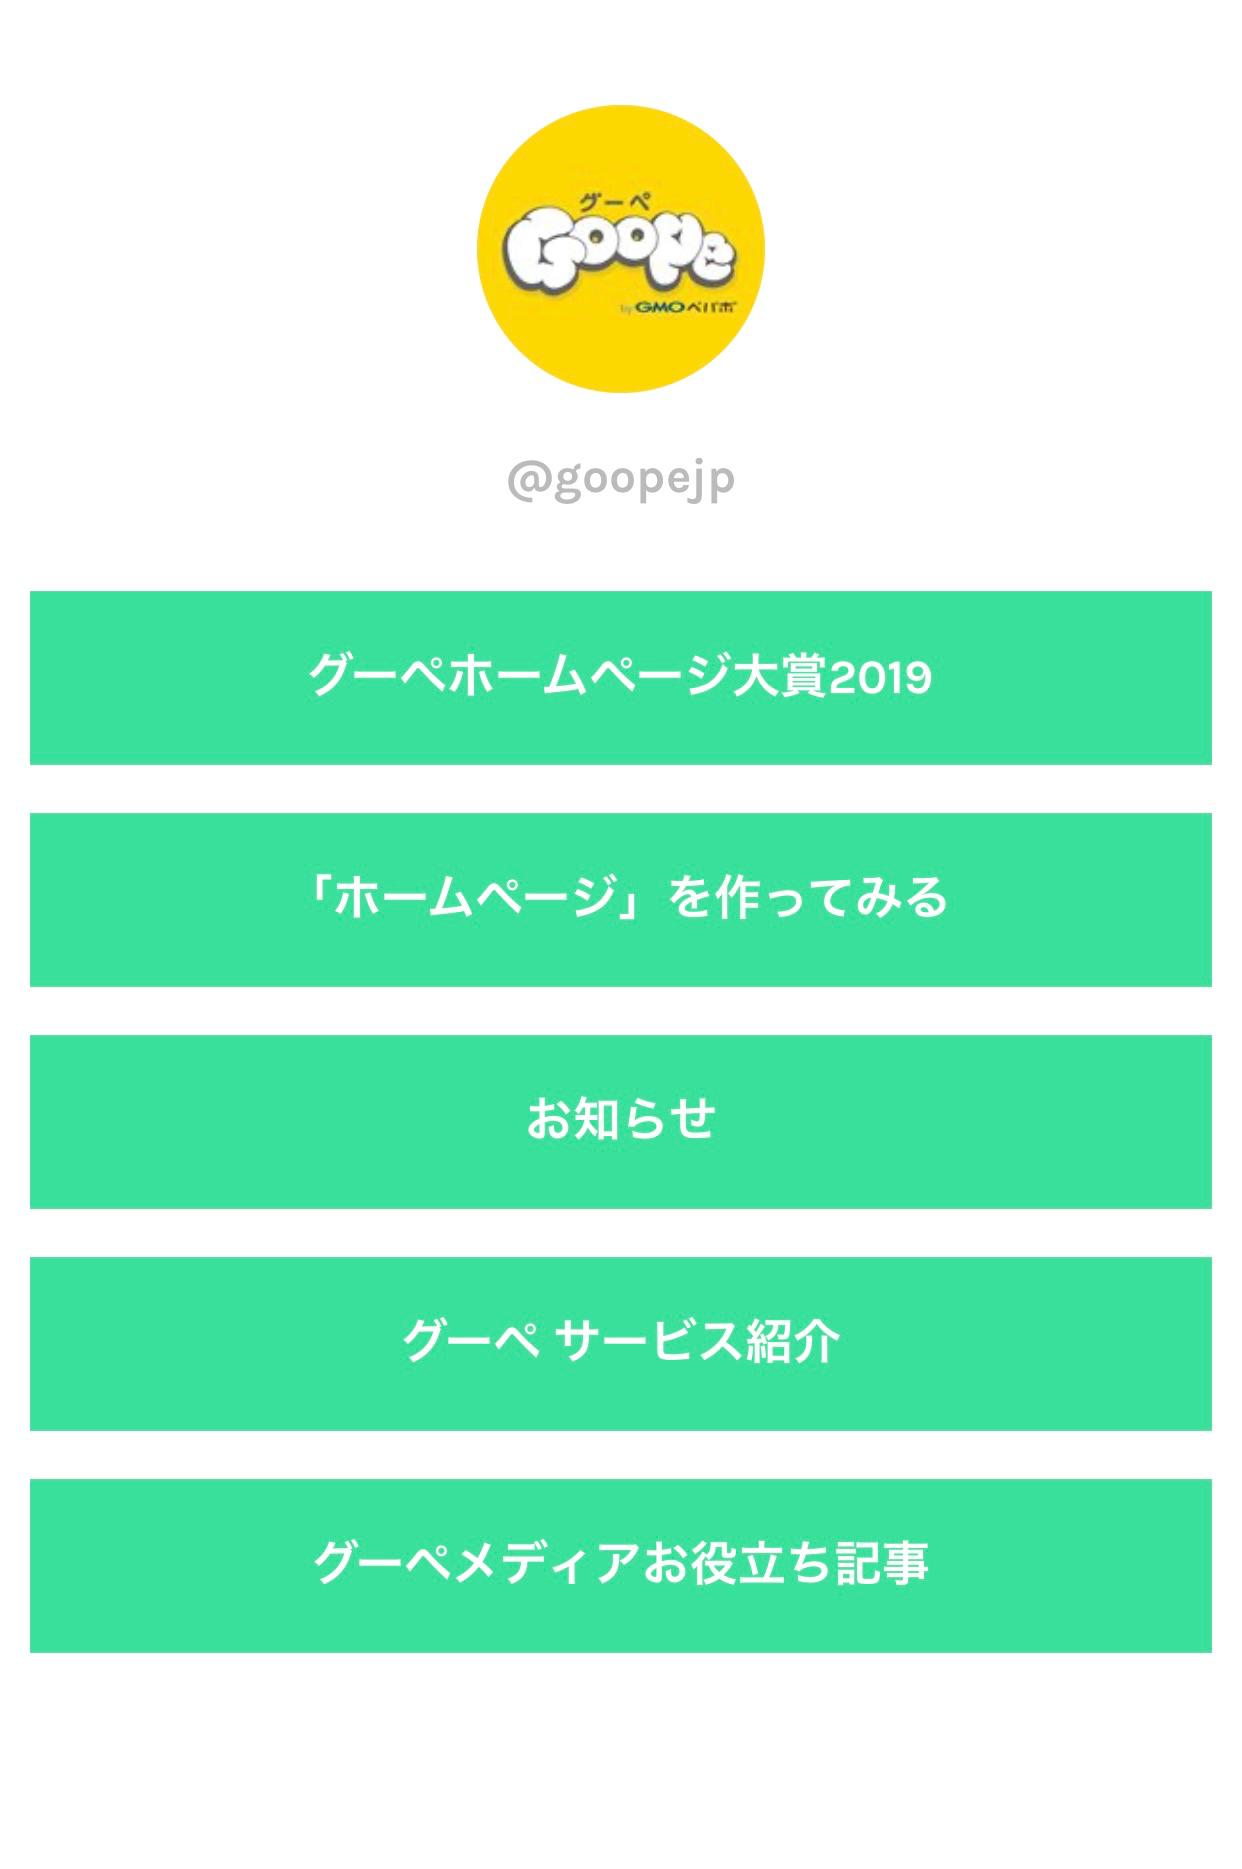 Instagrm上でのリンク先表示例2